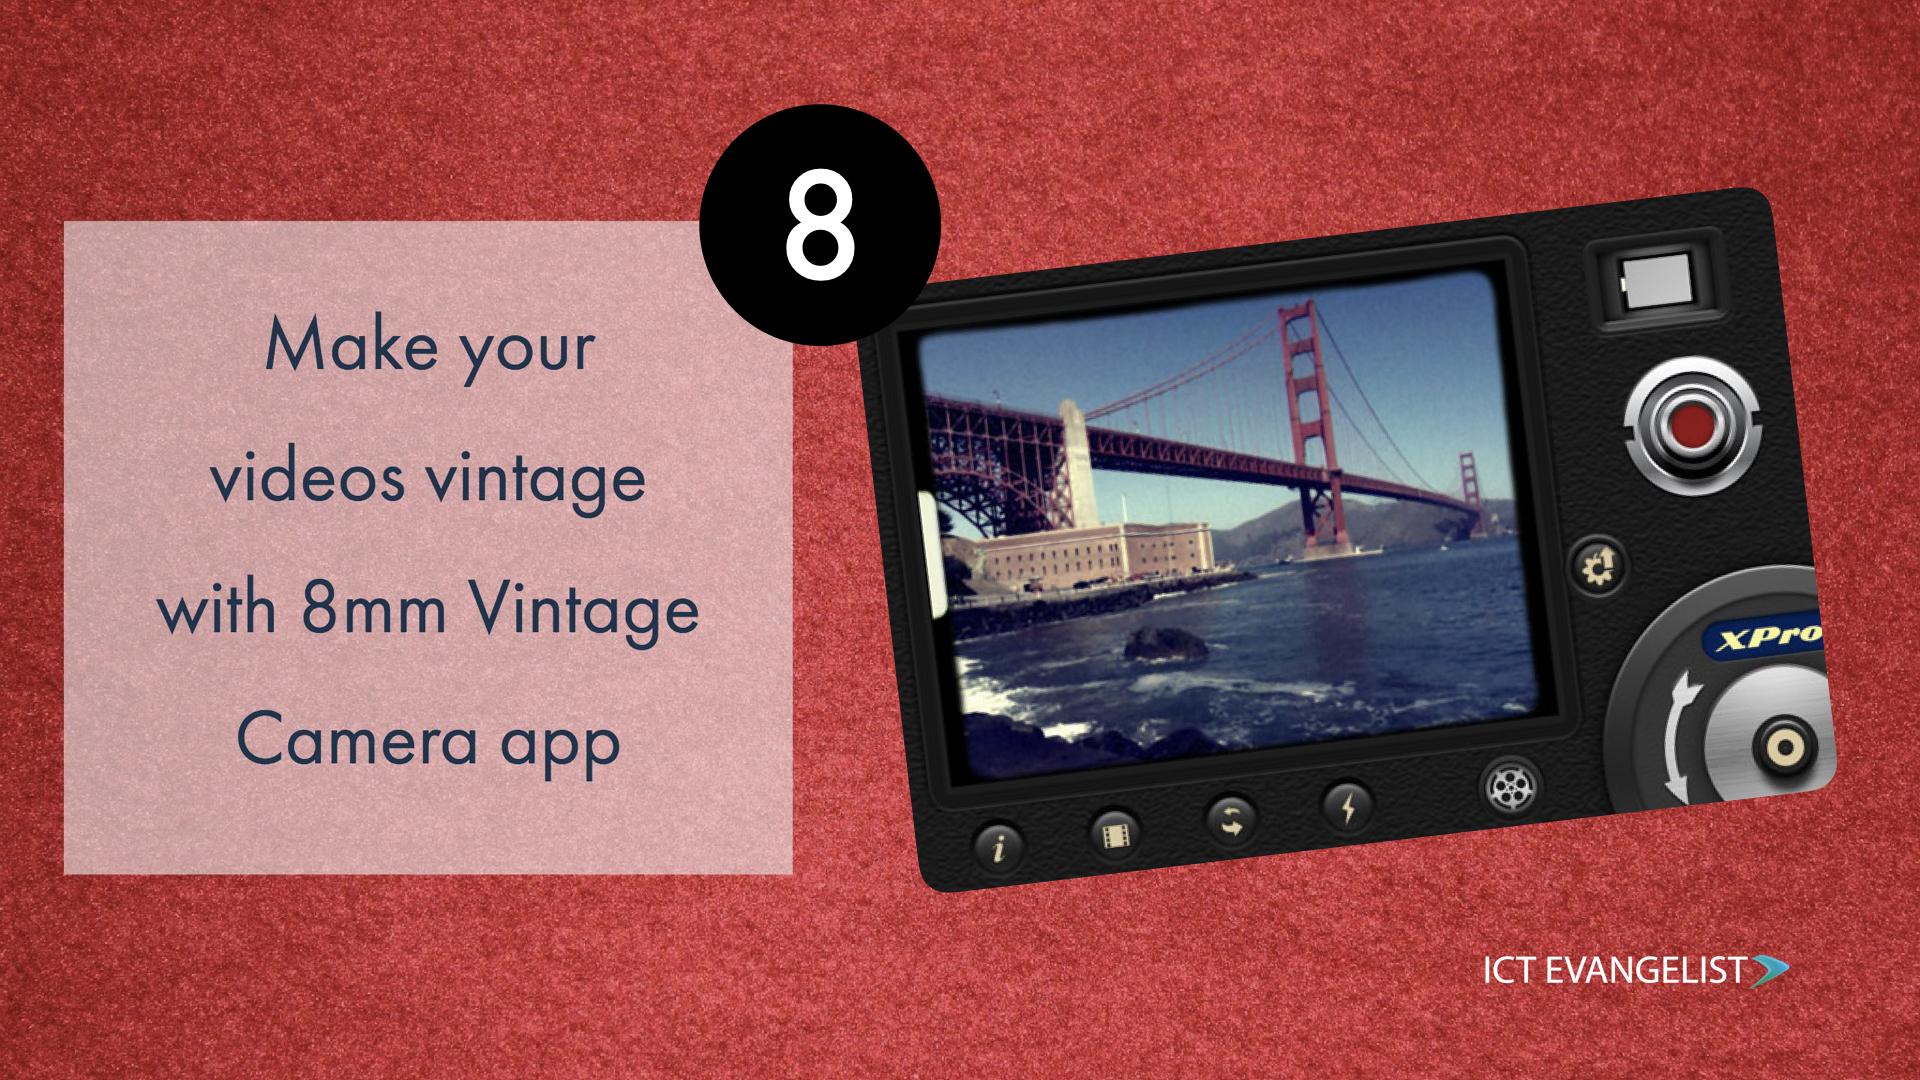 8Mm Vintage Camera make your videos vintage with 8mm – ictevangelist